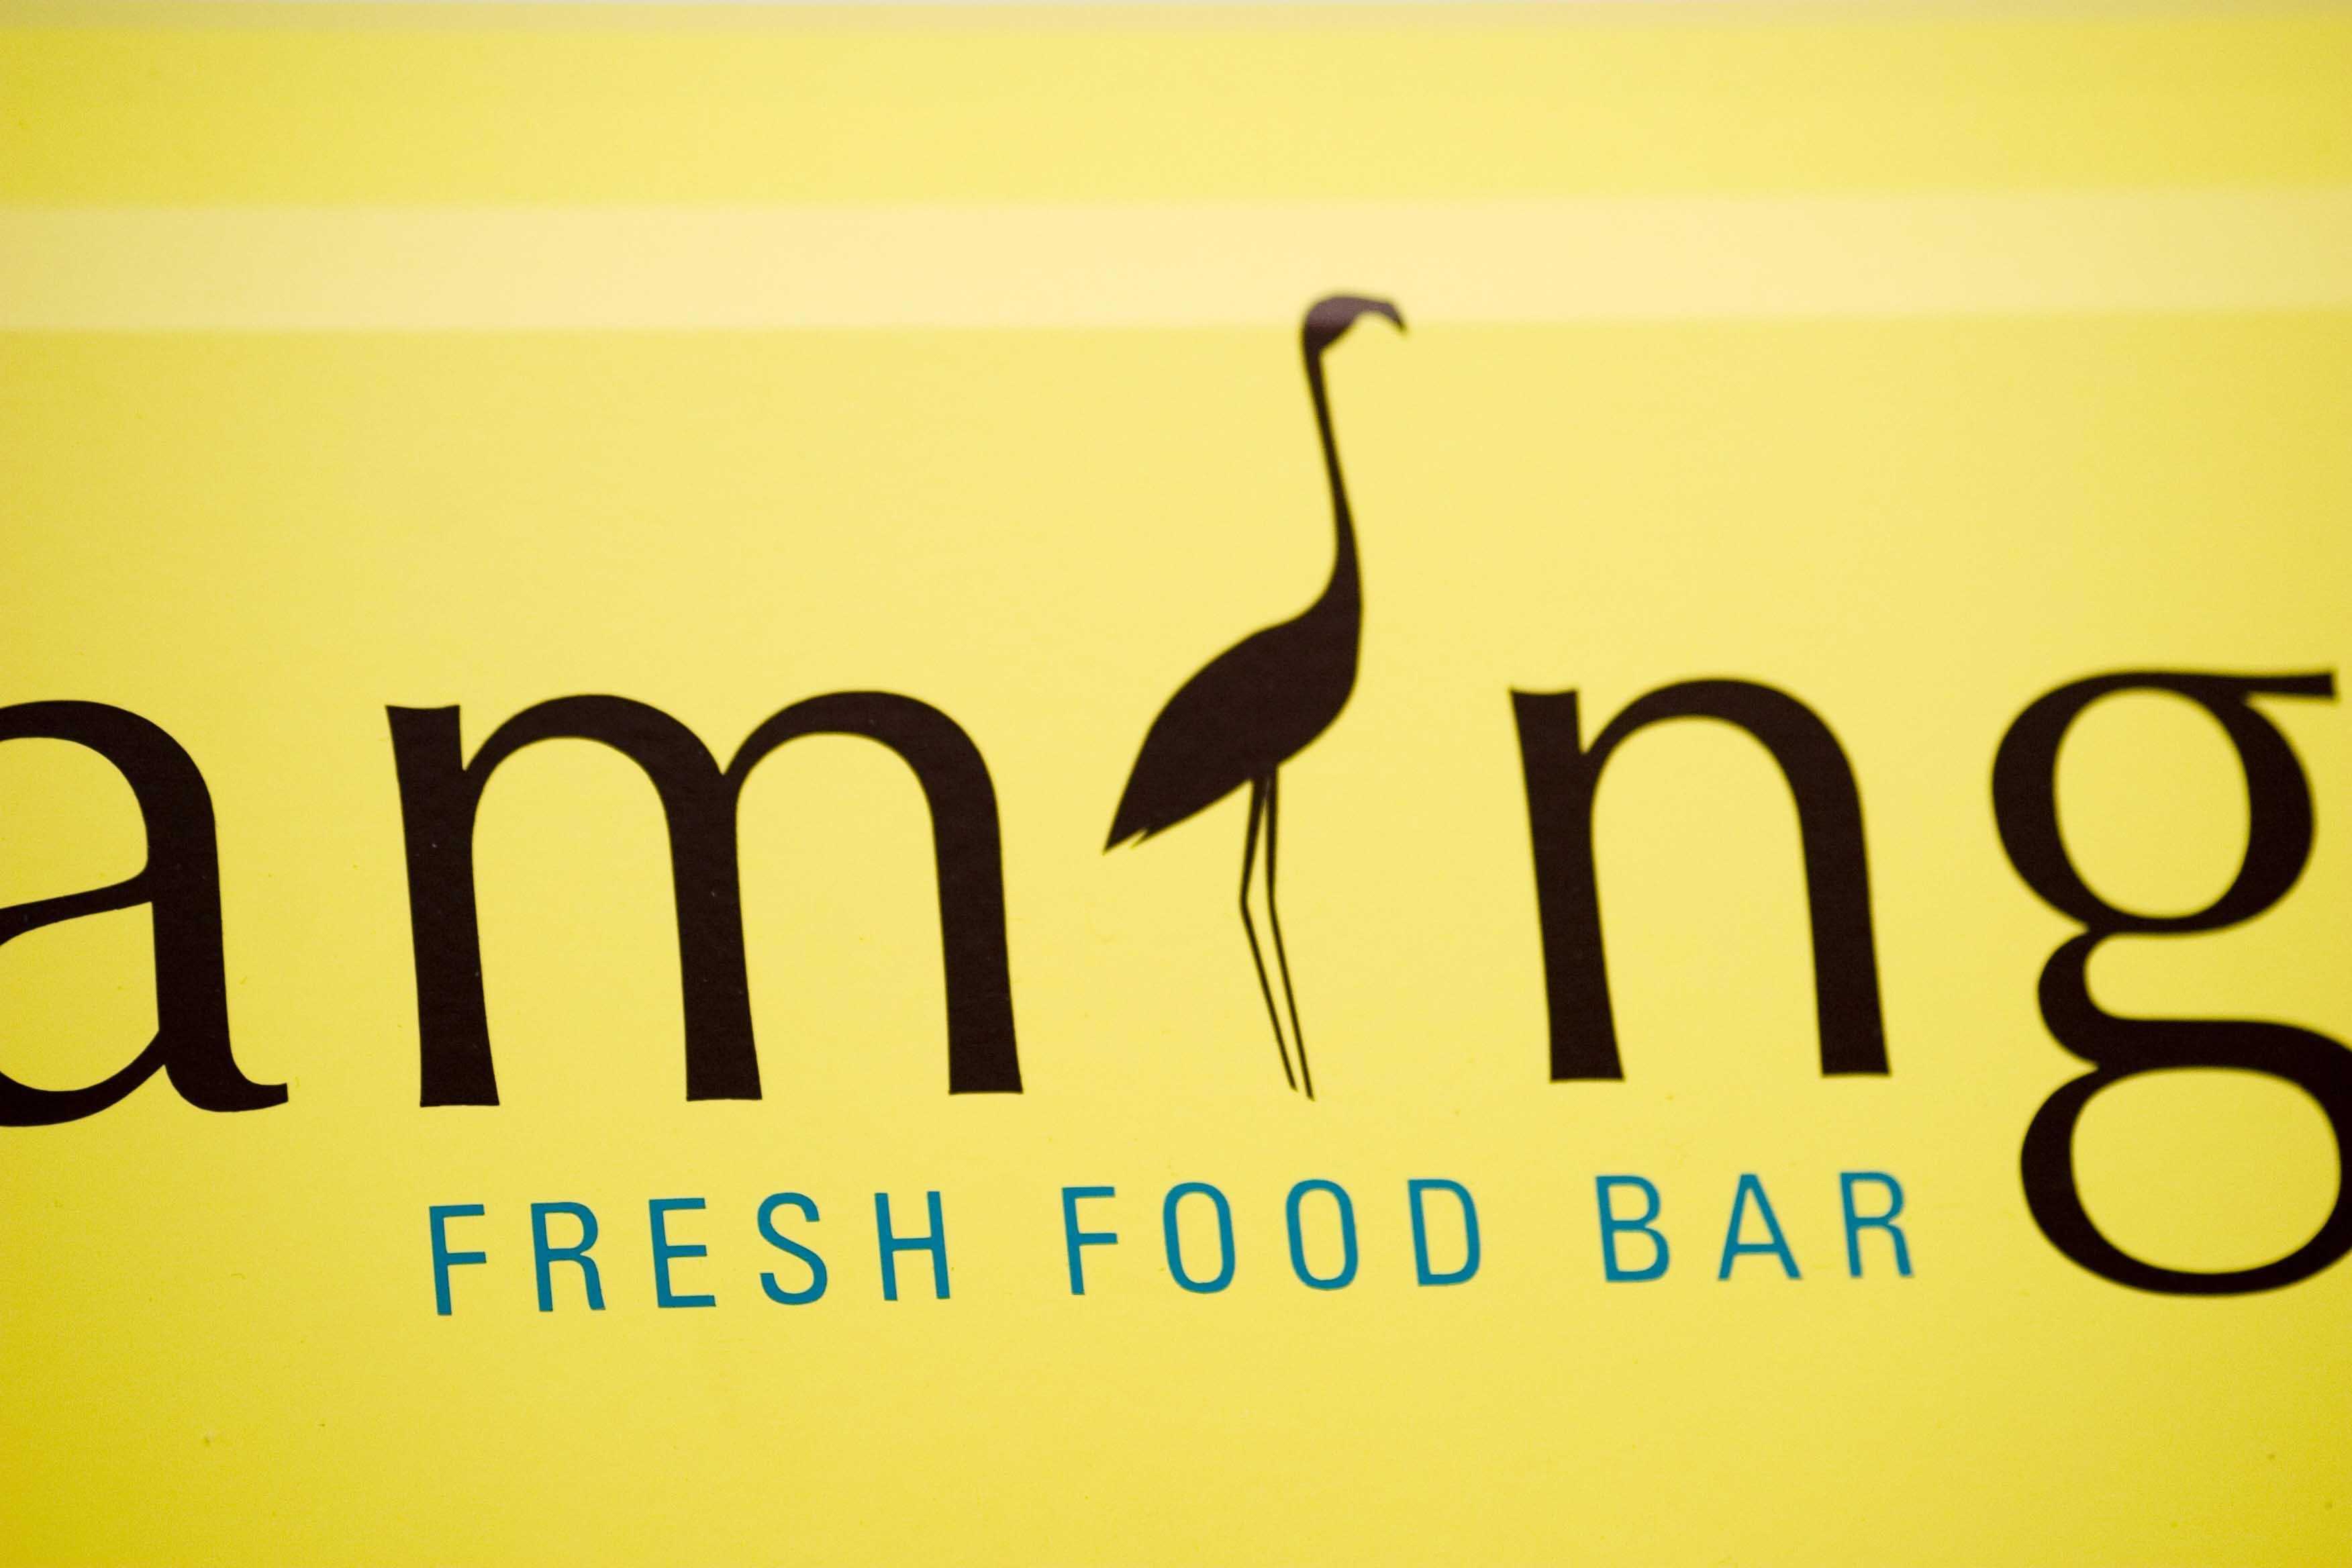 Flamingo Fresh Food Bar